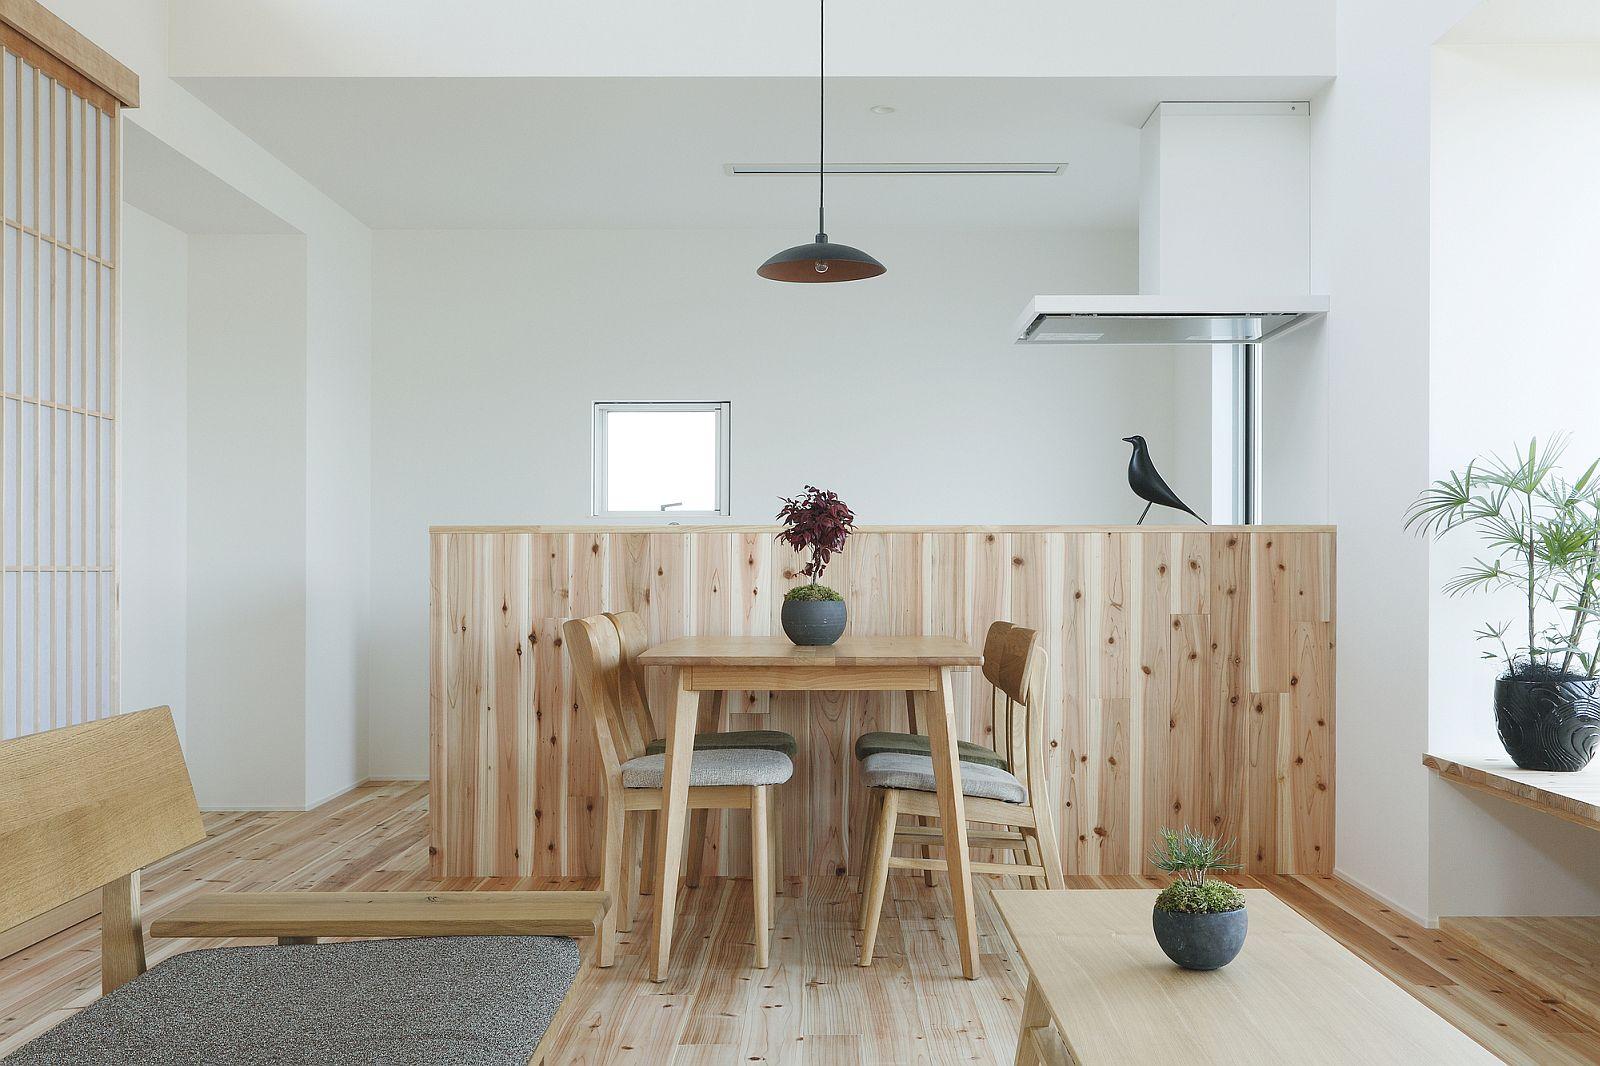 Gallery: A modest light-filled home in rural Japan   ALTS Design ...